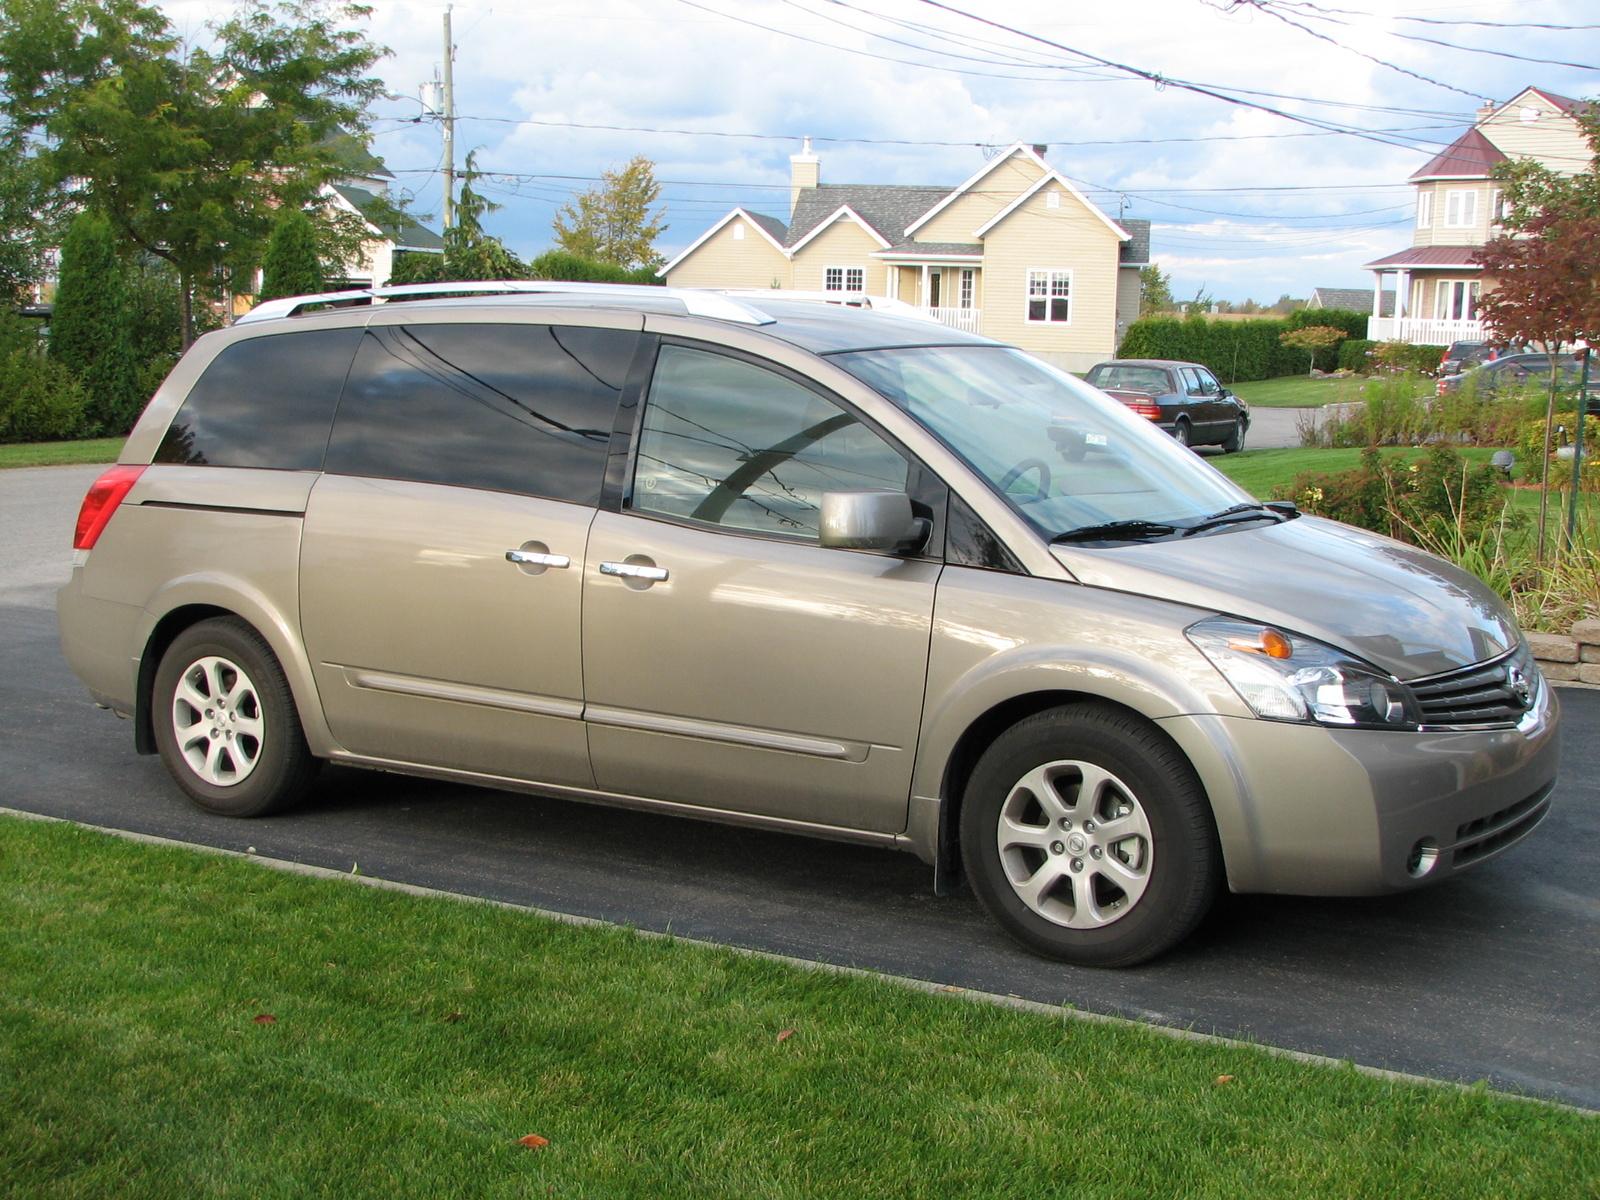 2008 Nissan Quest Pictures Cargurus